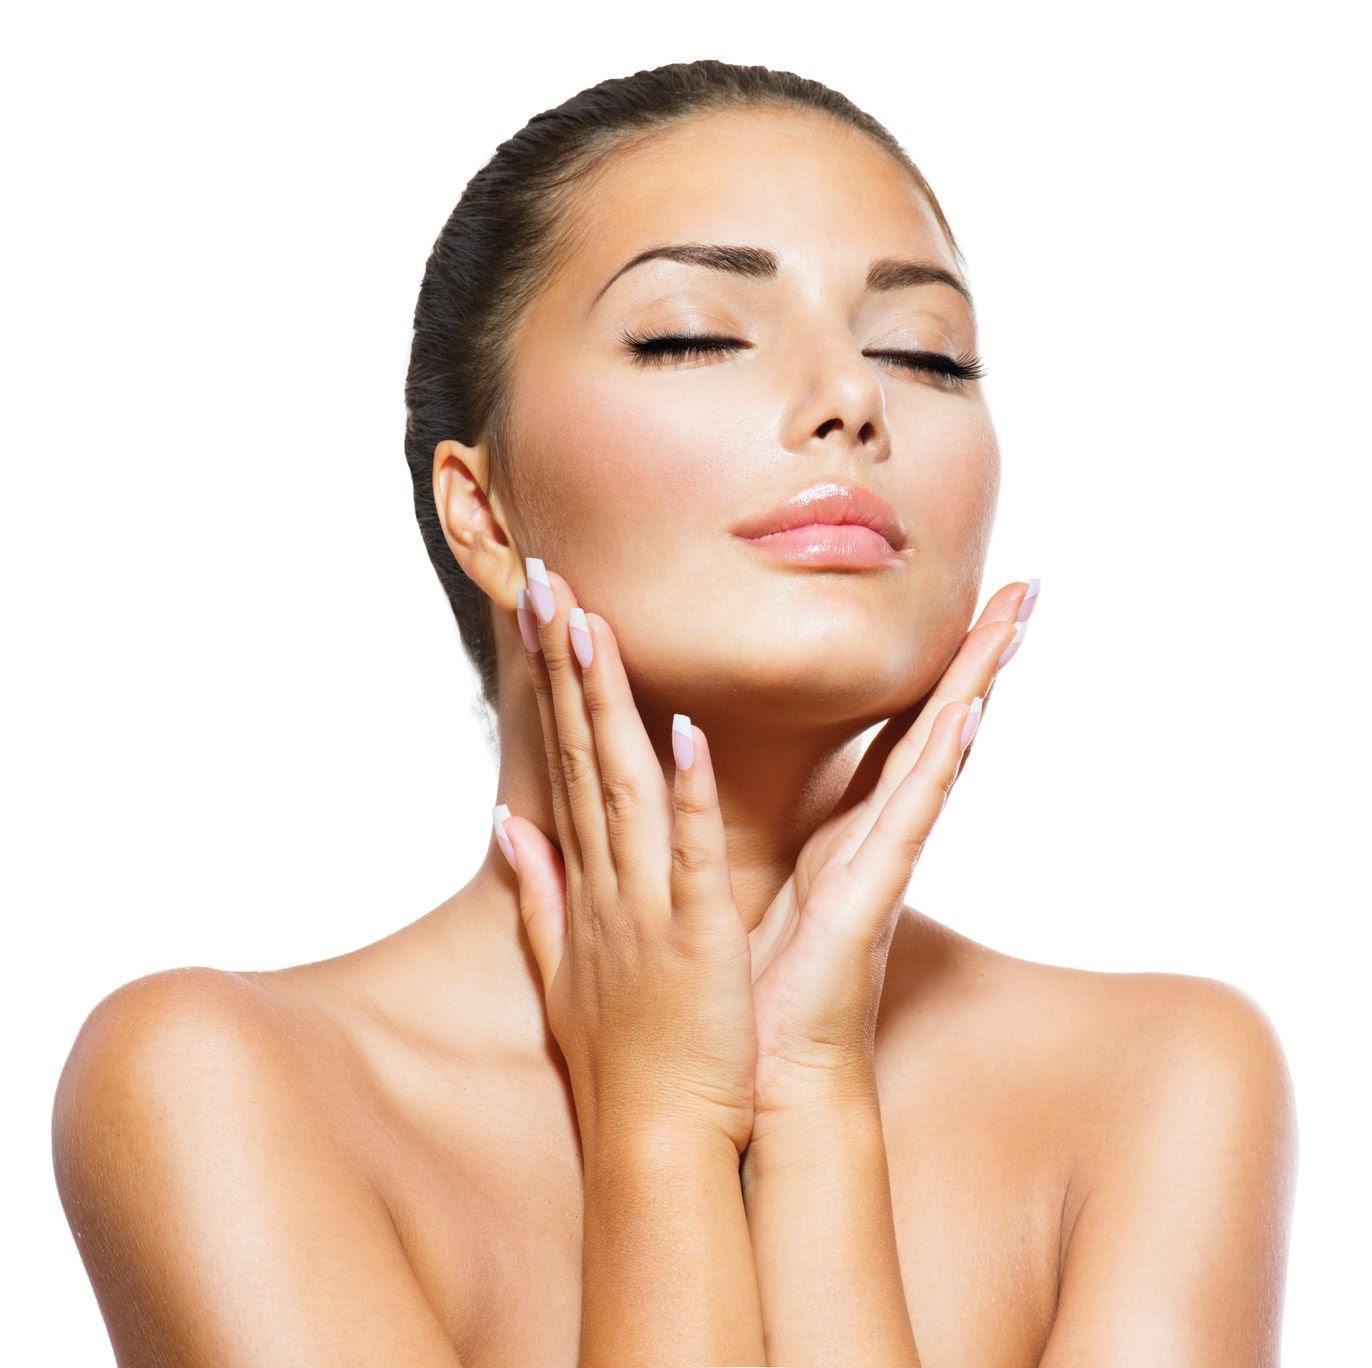 21386651 - beauty portrait  beautiful spa woman touching her face